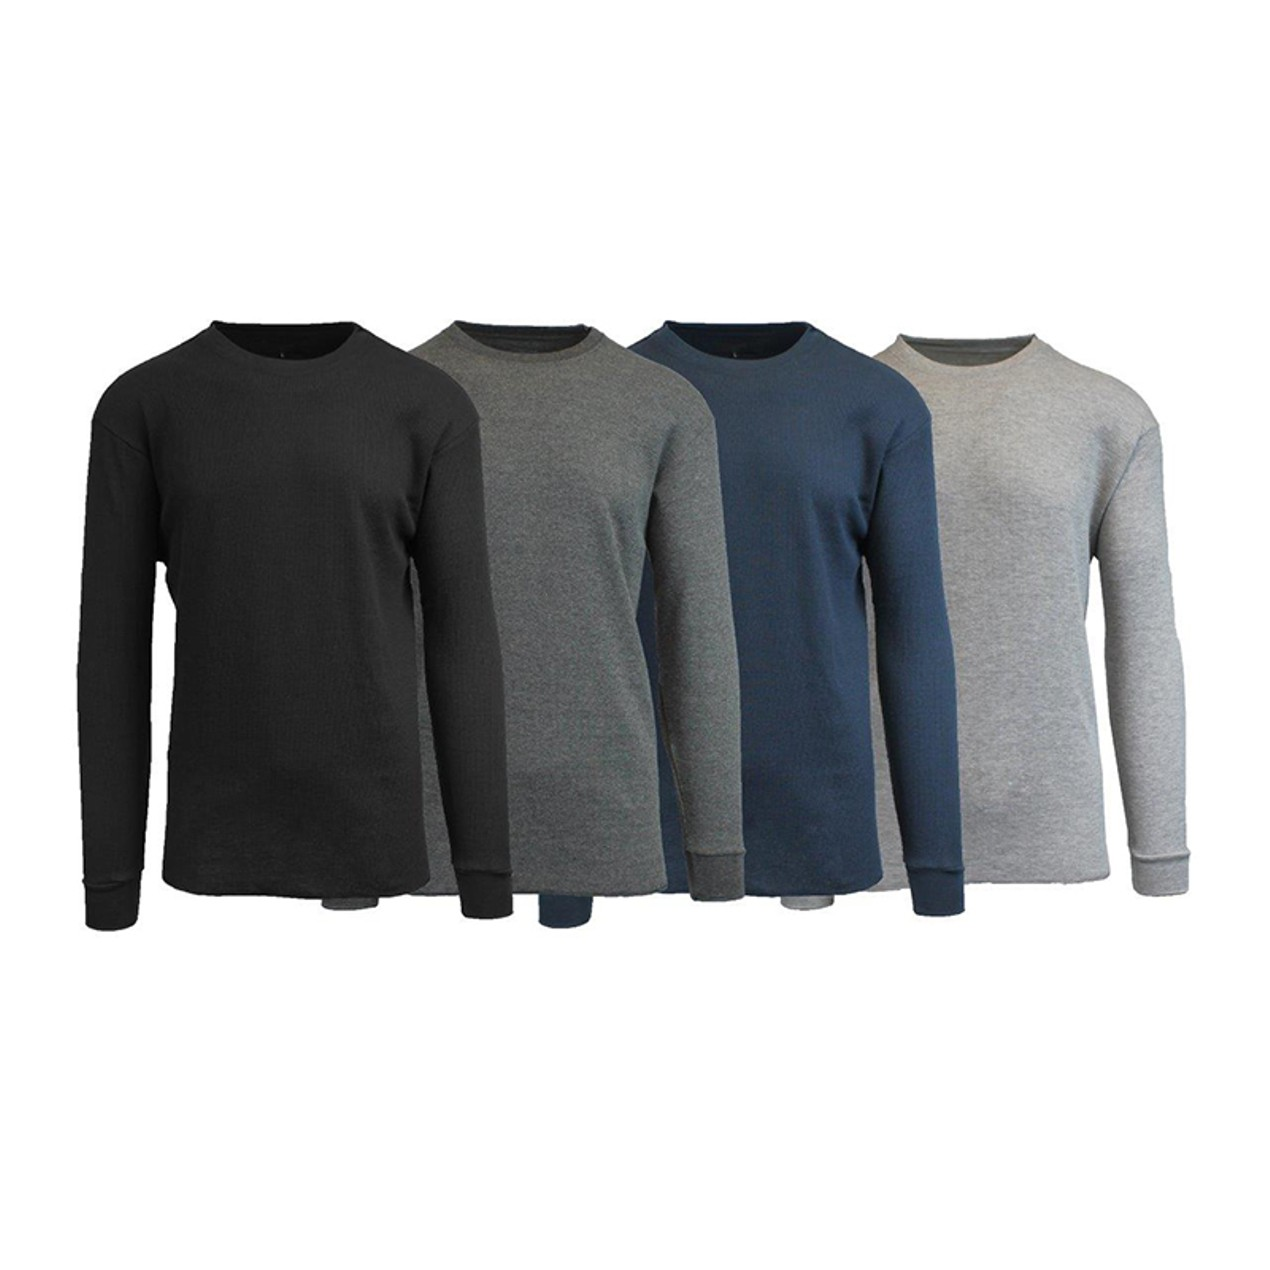 20a5488ed972 4-Pack  Men s Galaxy by Harvic Waffle Knit Thermal Shirts - Tanga